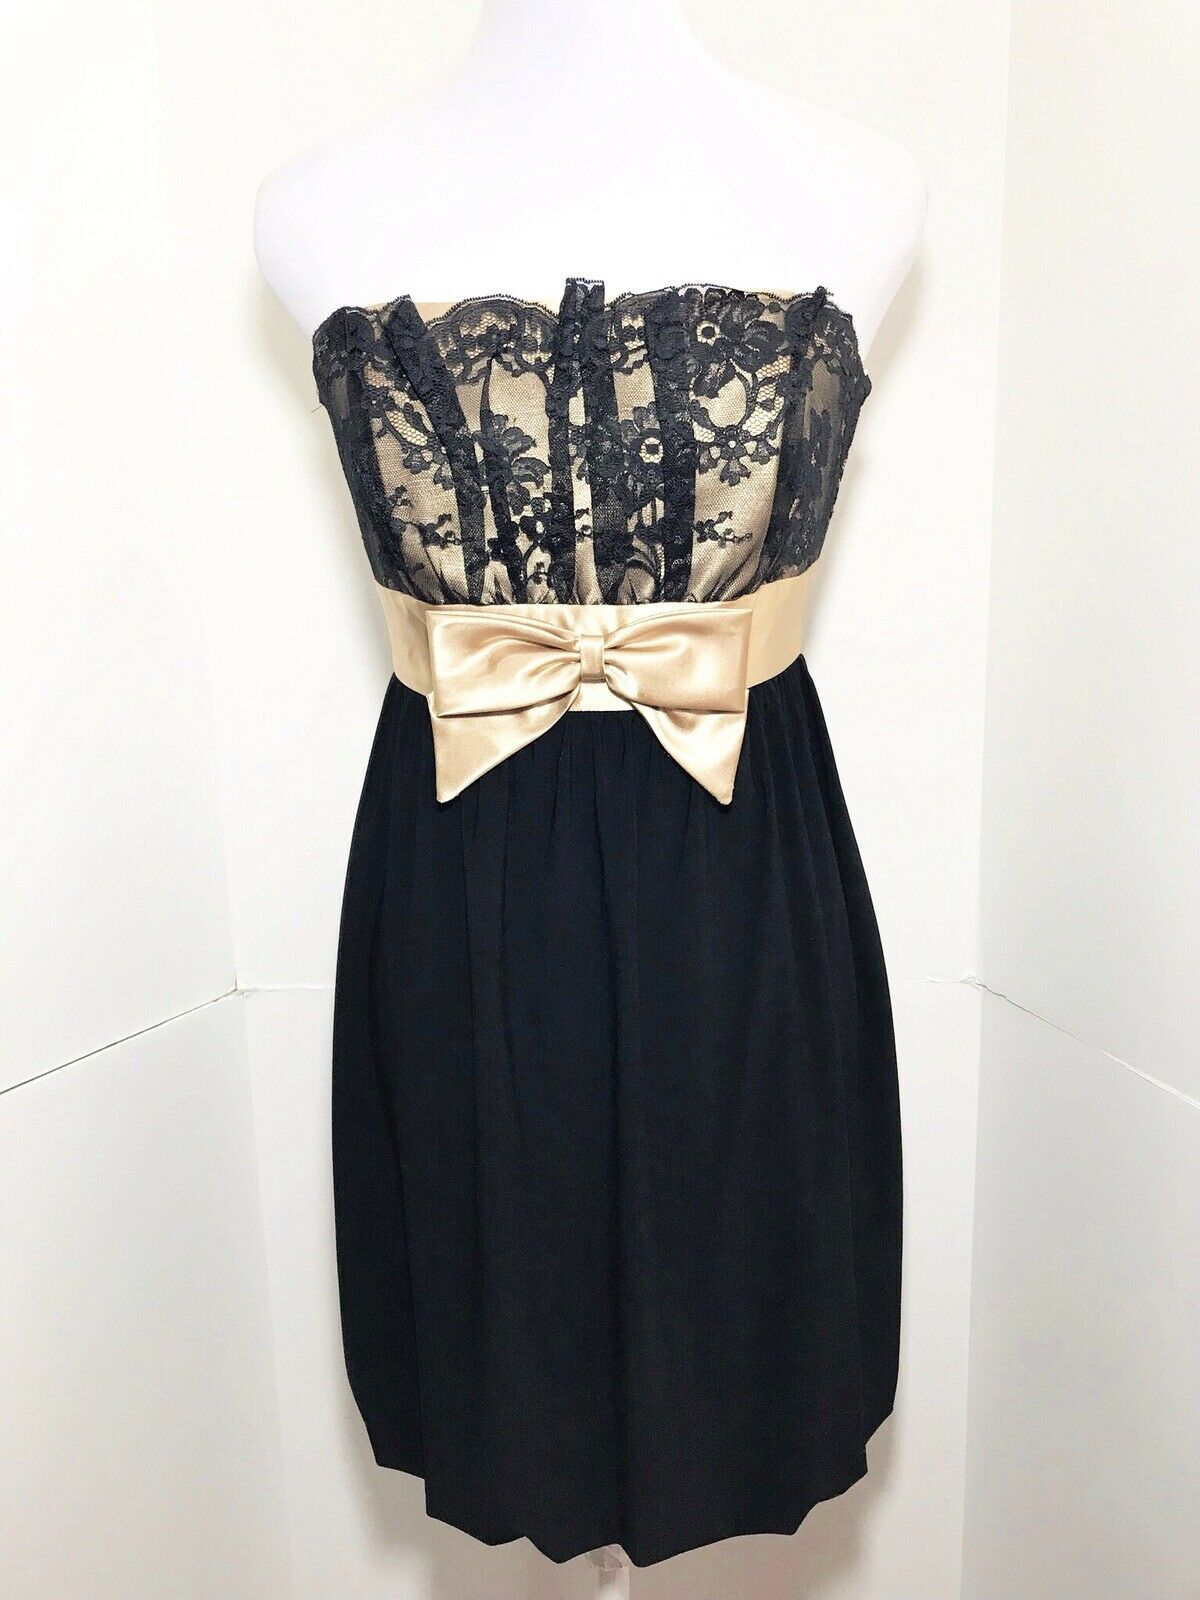 VTG 90's Gunne Sax Small 5 schwarz Floral Lace Mini Dress Gold Bow Strapless